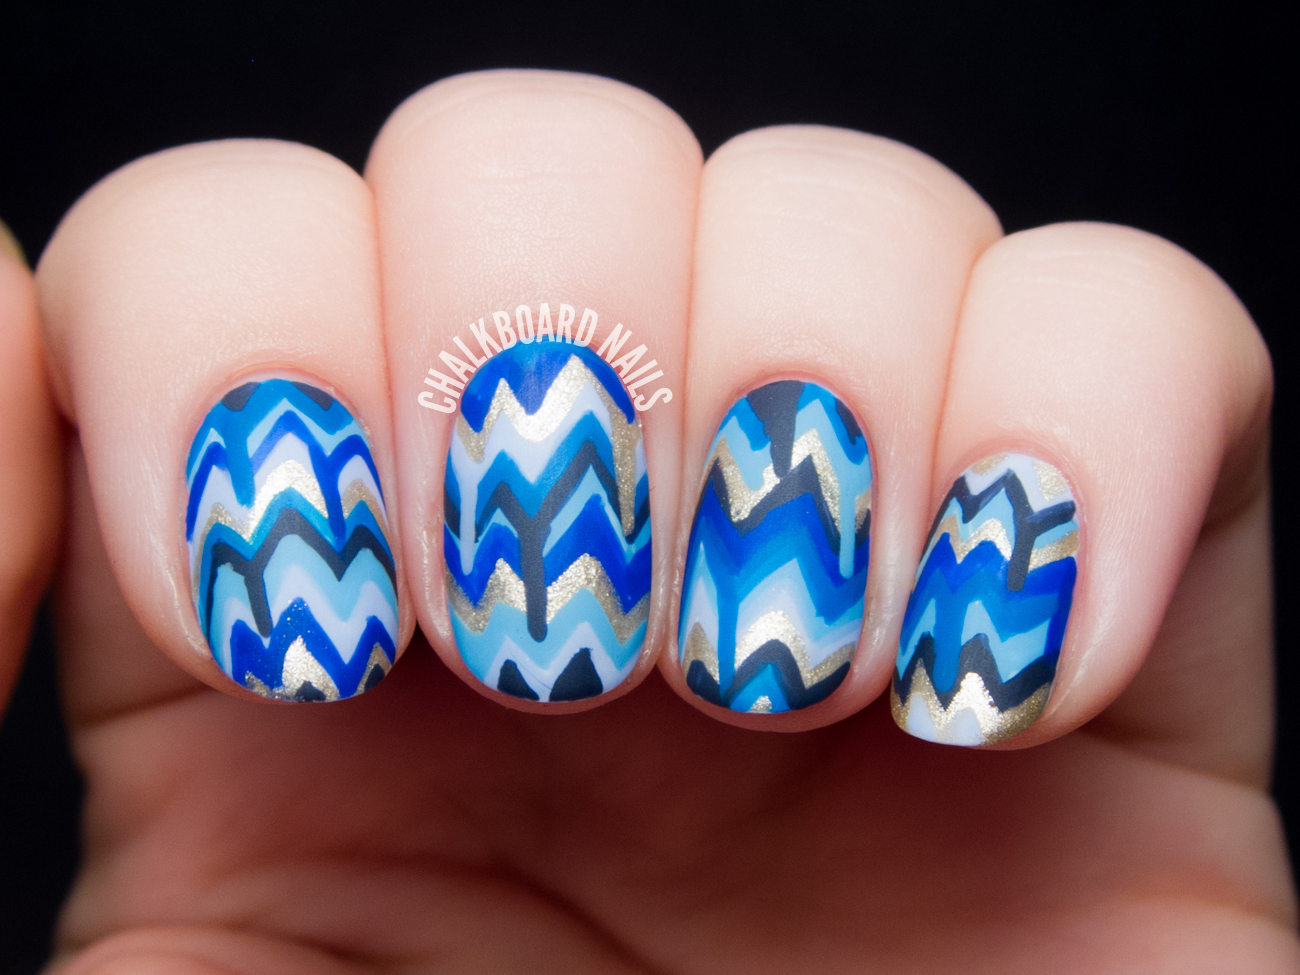 Blue Dripping Chevron Nail Art | Chalkboard Nails | Nail Art Blog